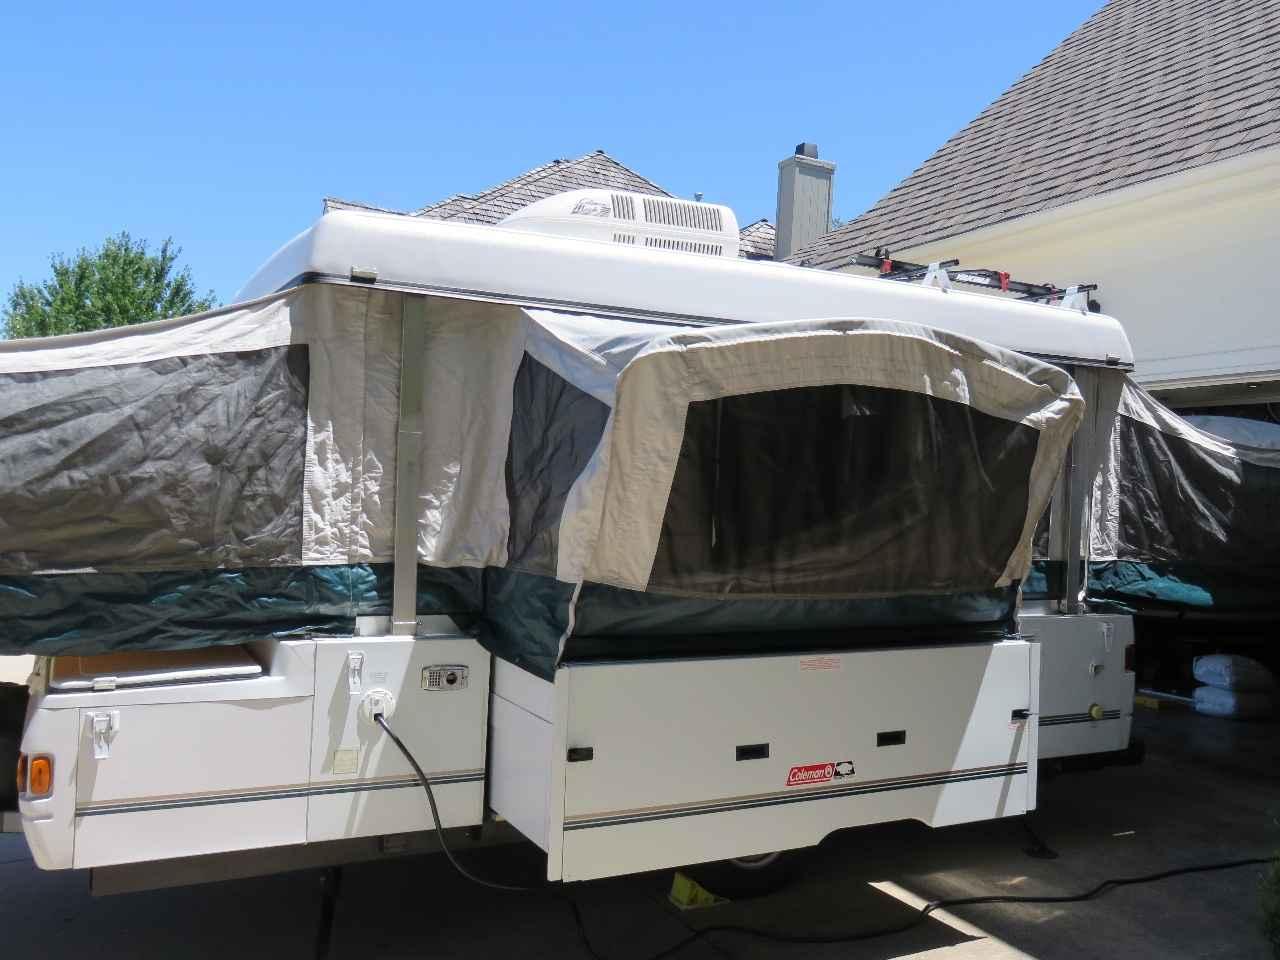 2000 used coleman grand tour utah pop up camper in missouri mo